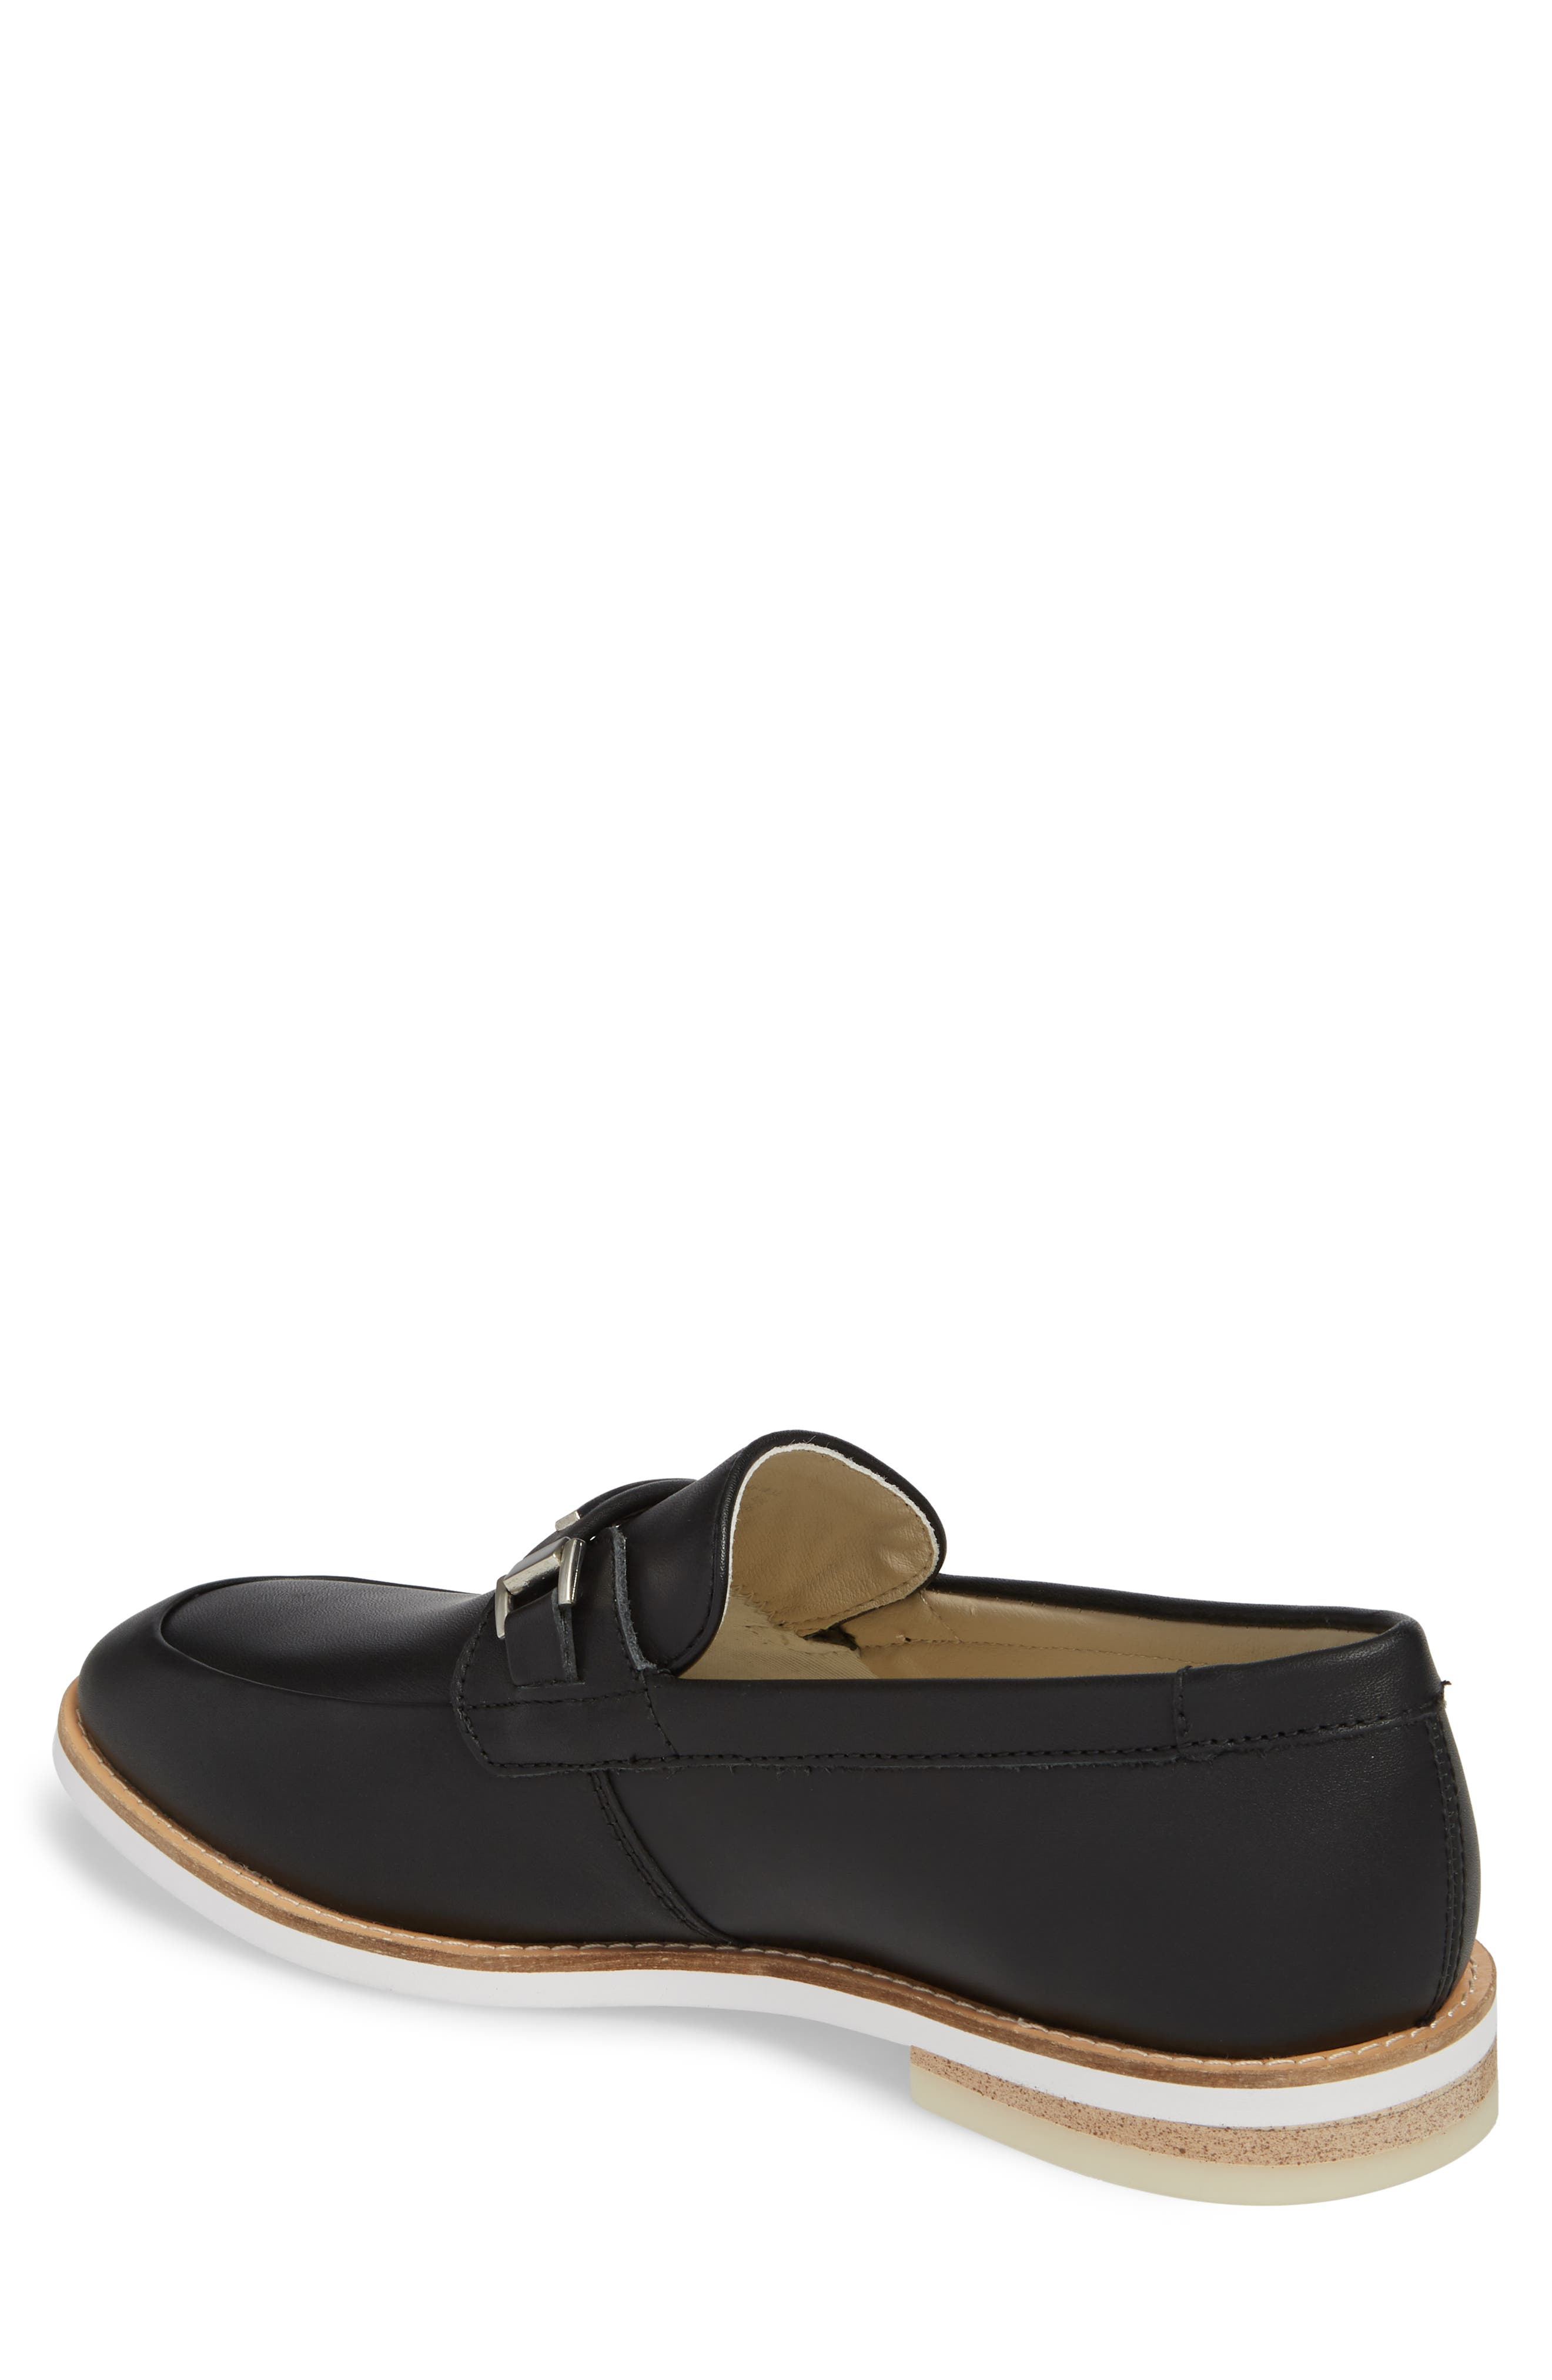 Adler Bit Loafer,                             Alternate thumbnail 2, color,                             Black Leather